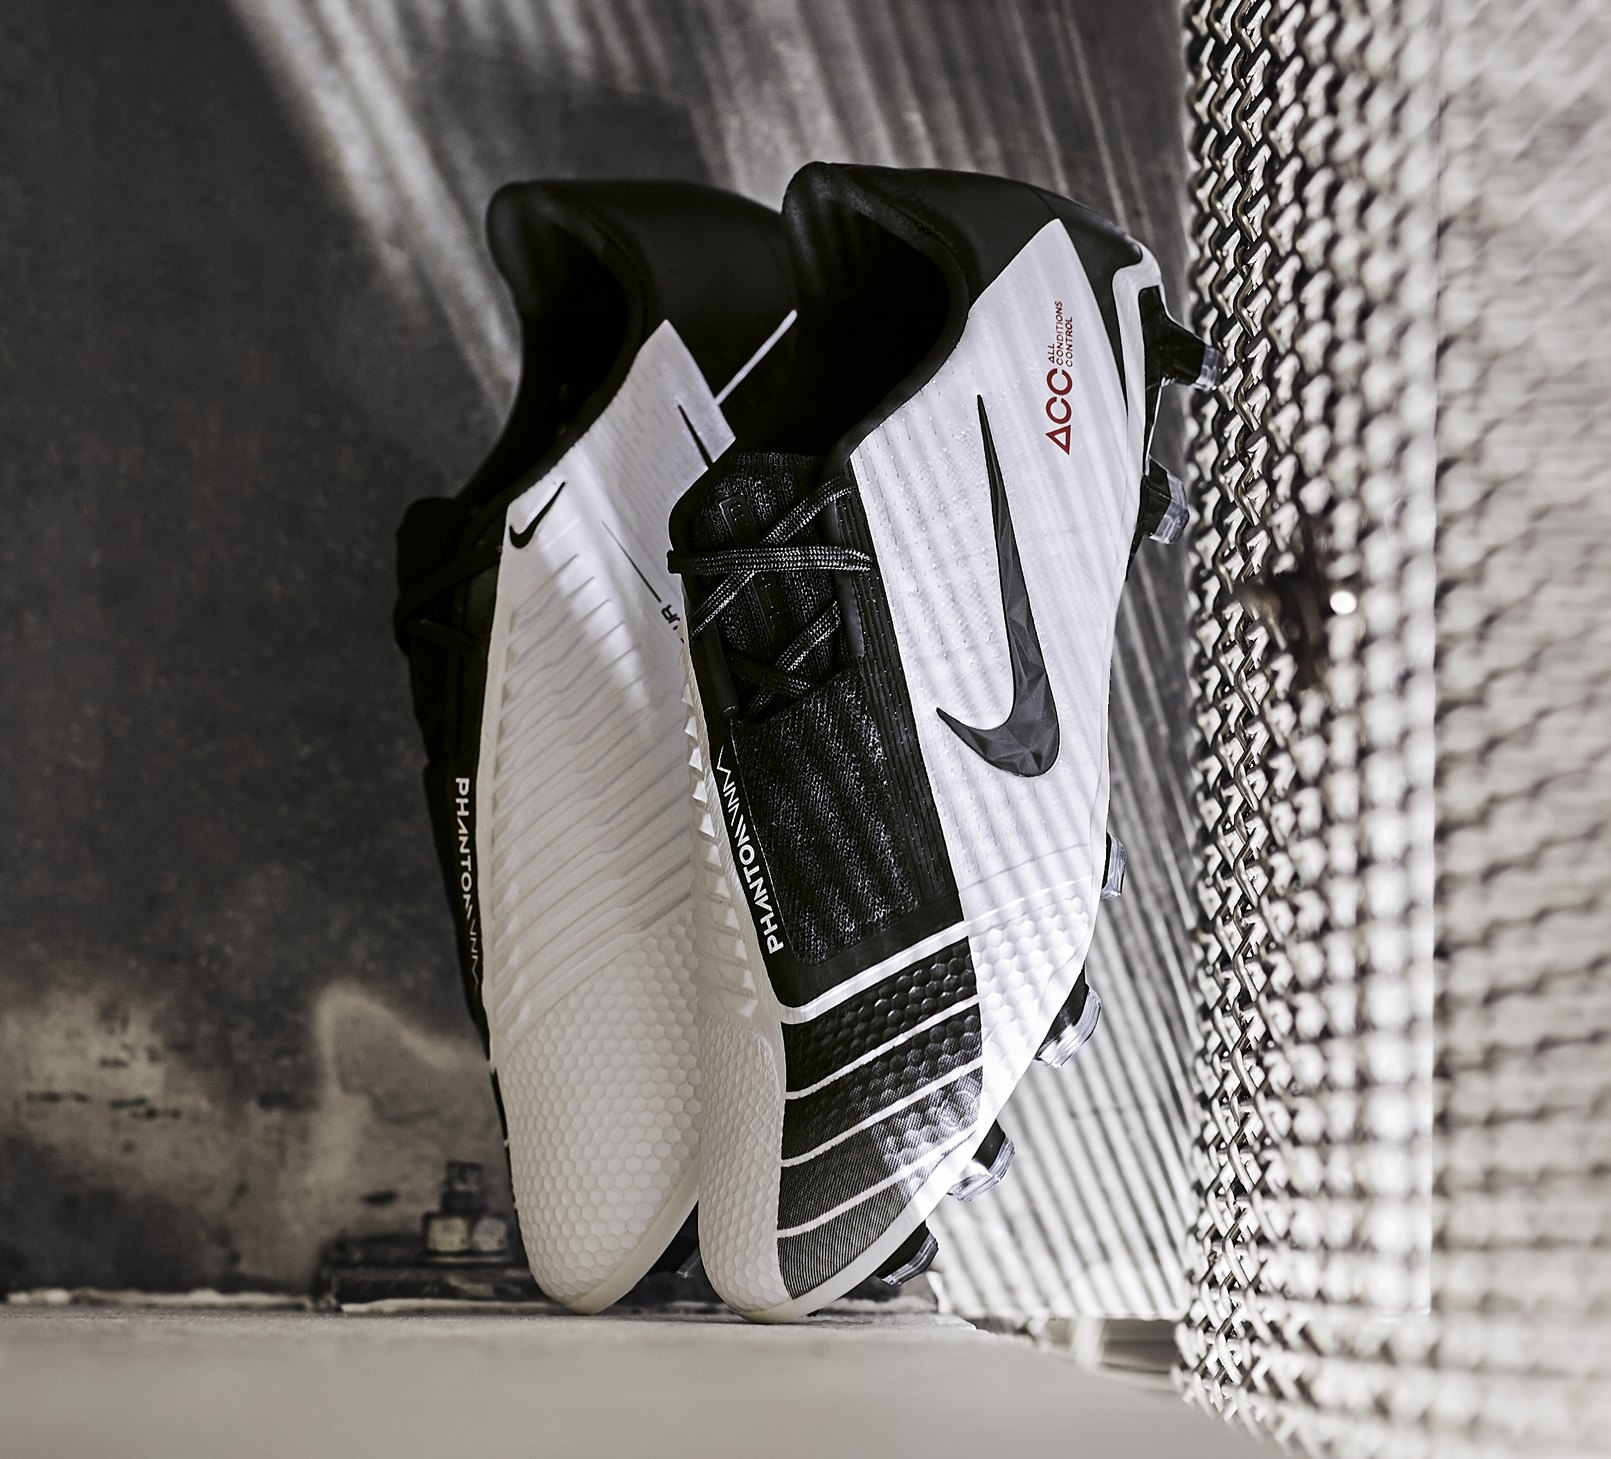 Botines Phantom VNM Future DNA T90 | Imagen Nike